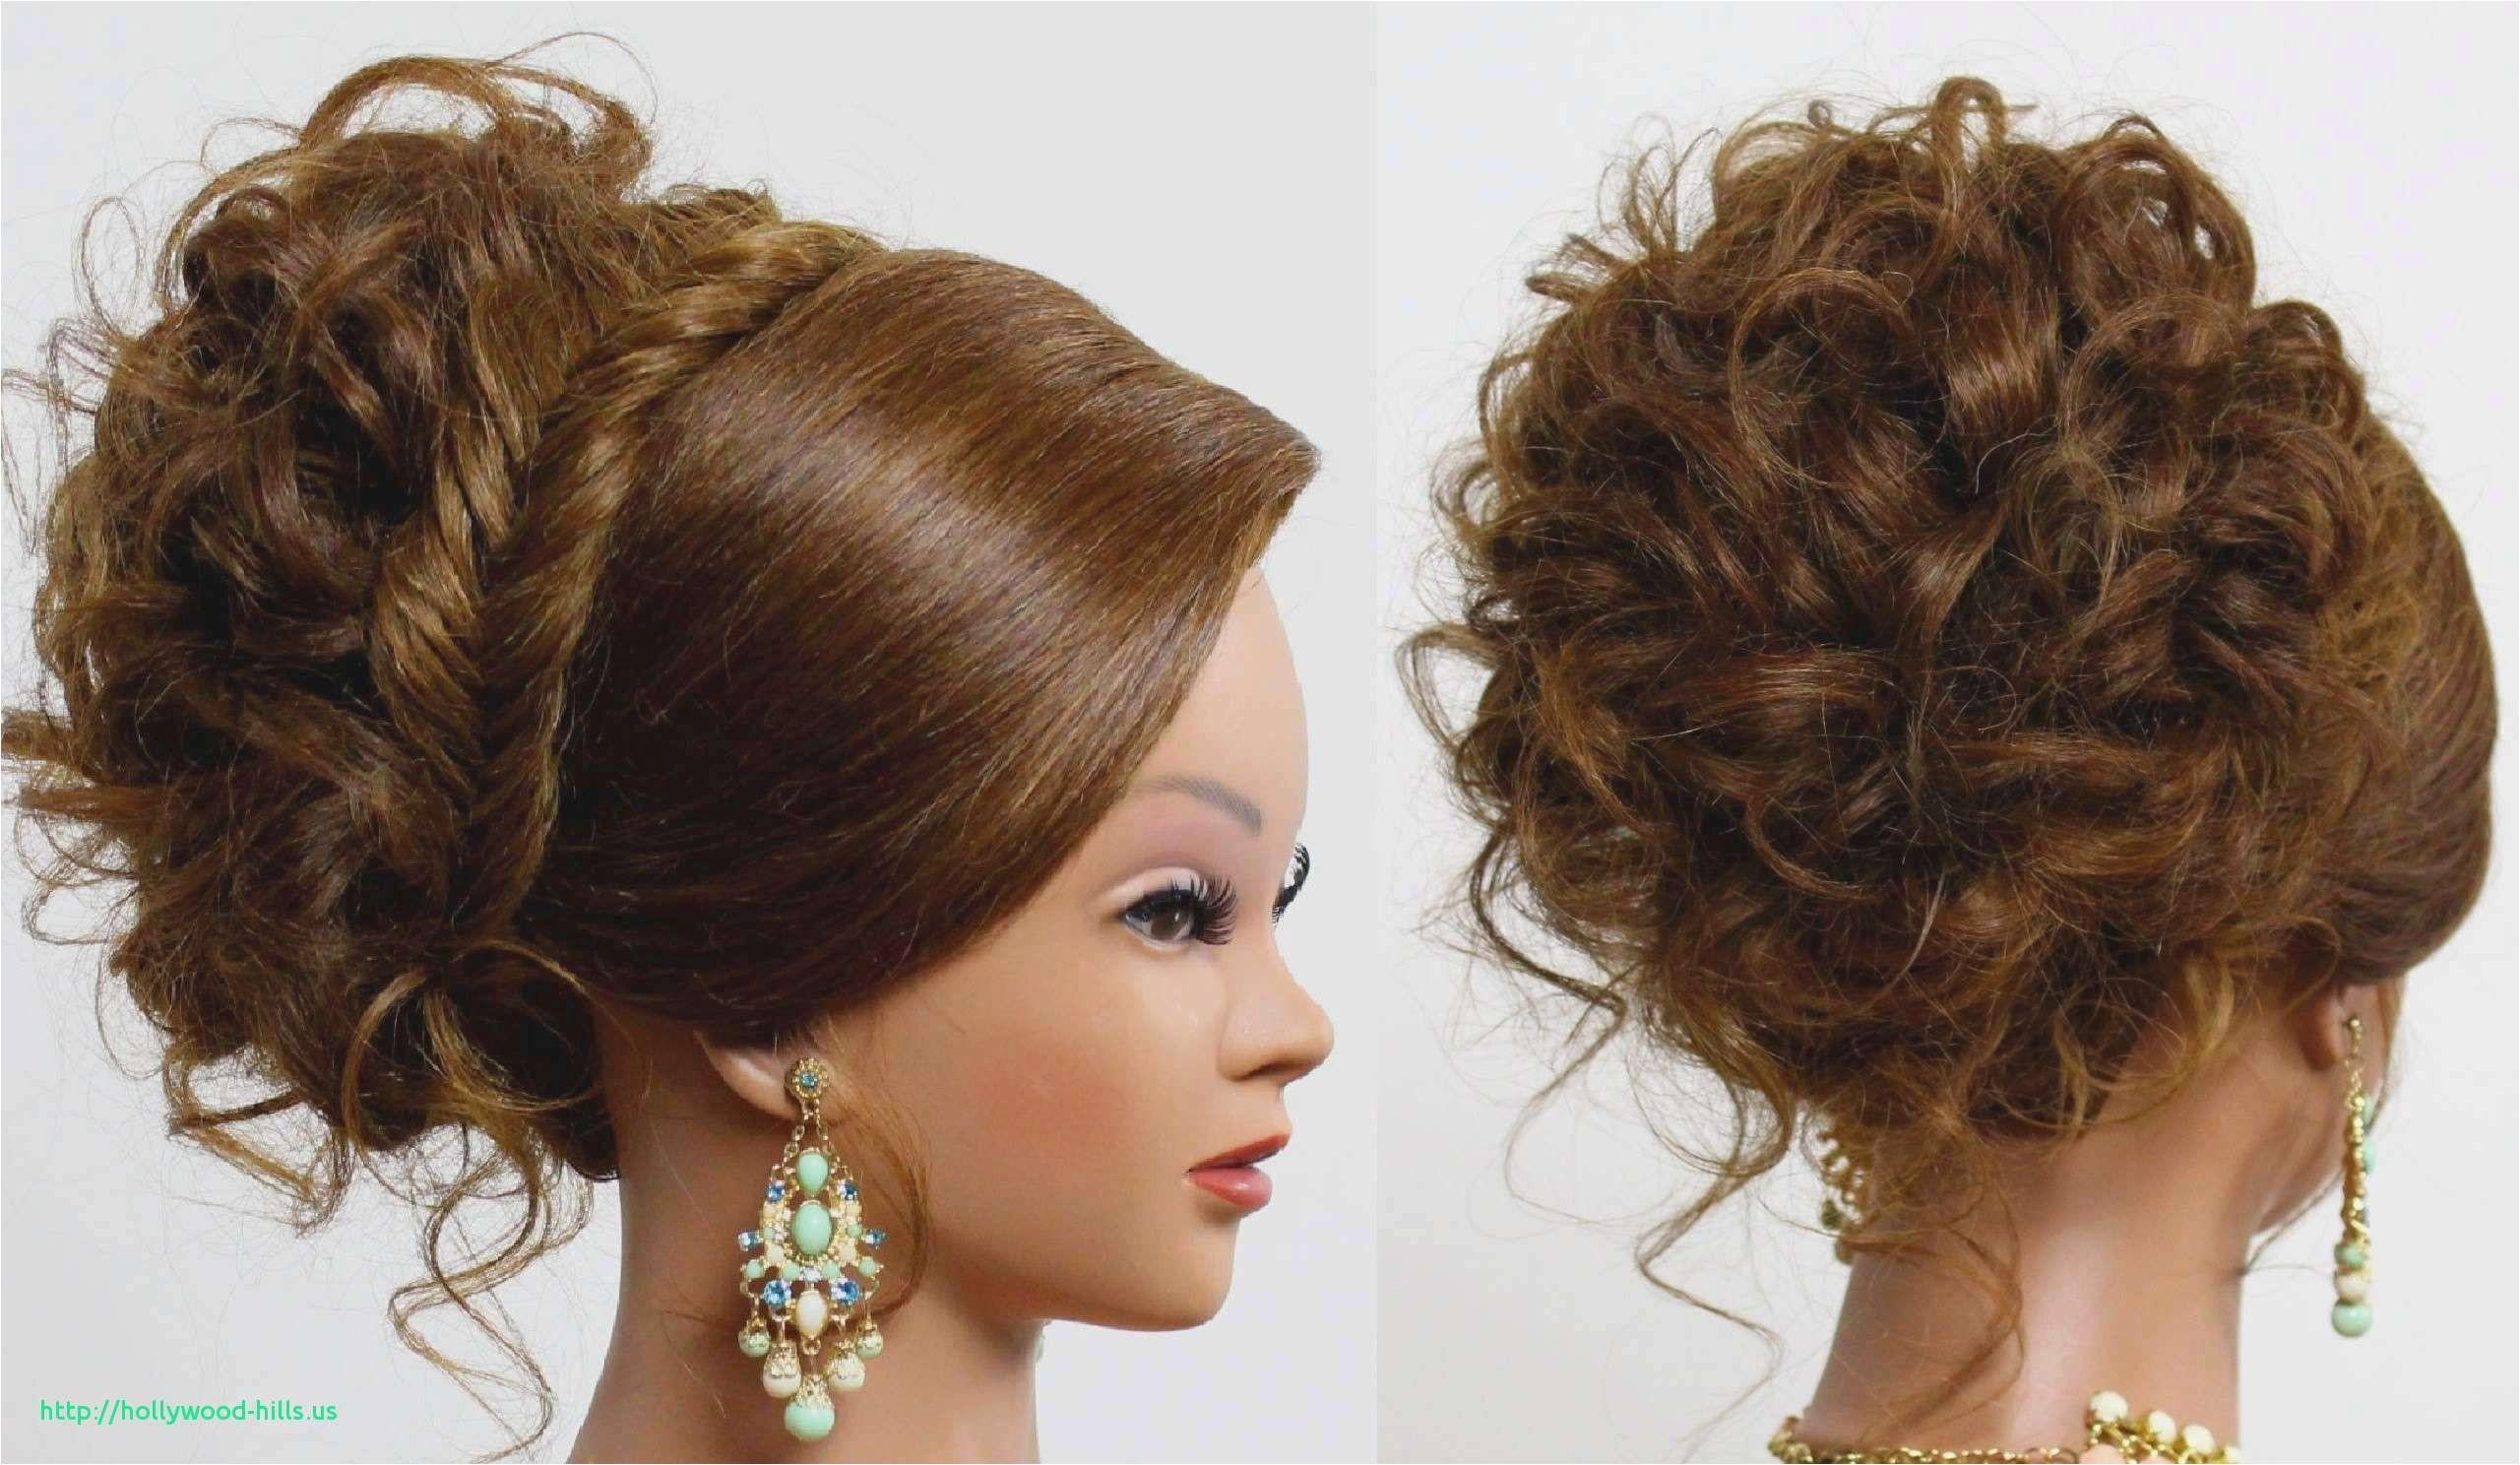 80s Hairstyles Girls Elegant Lovely 80s Hairstyles For Long Hair – Aidasmakeup